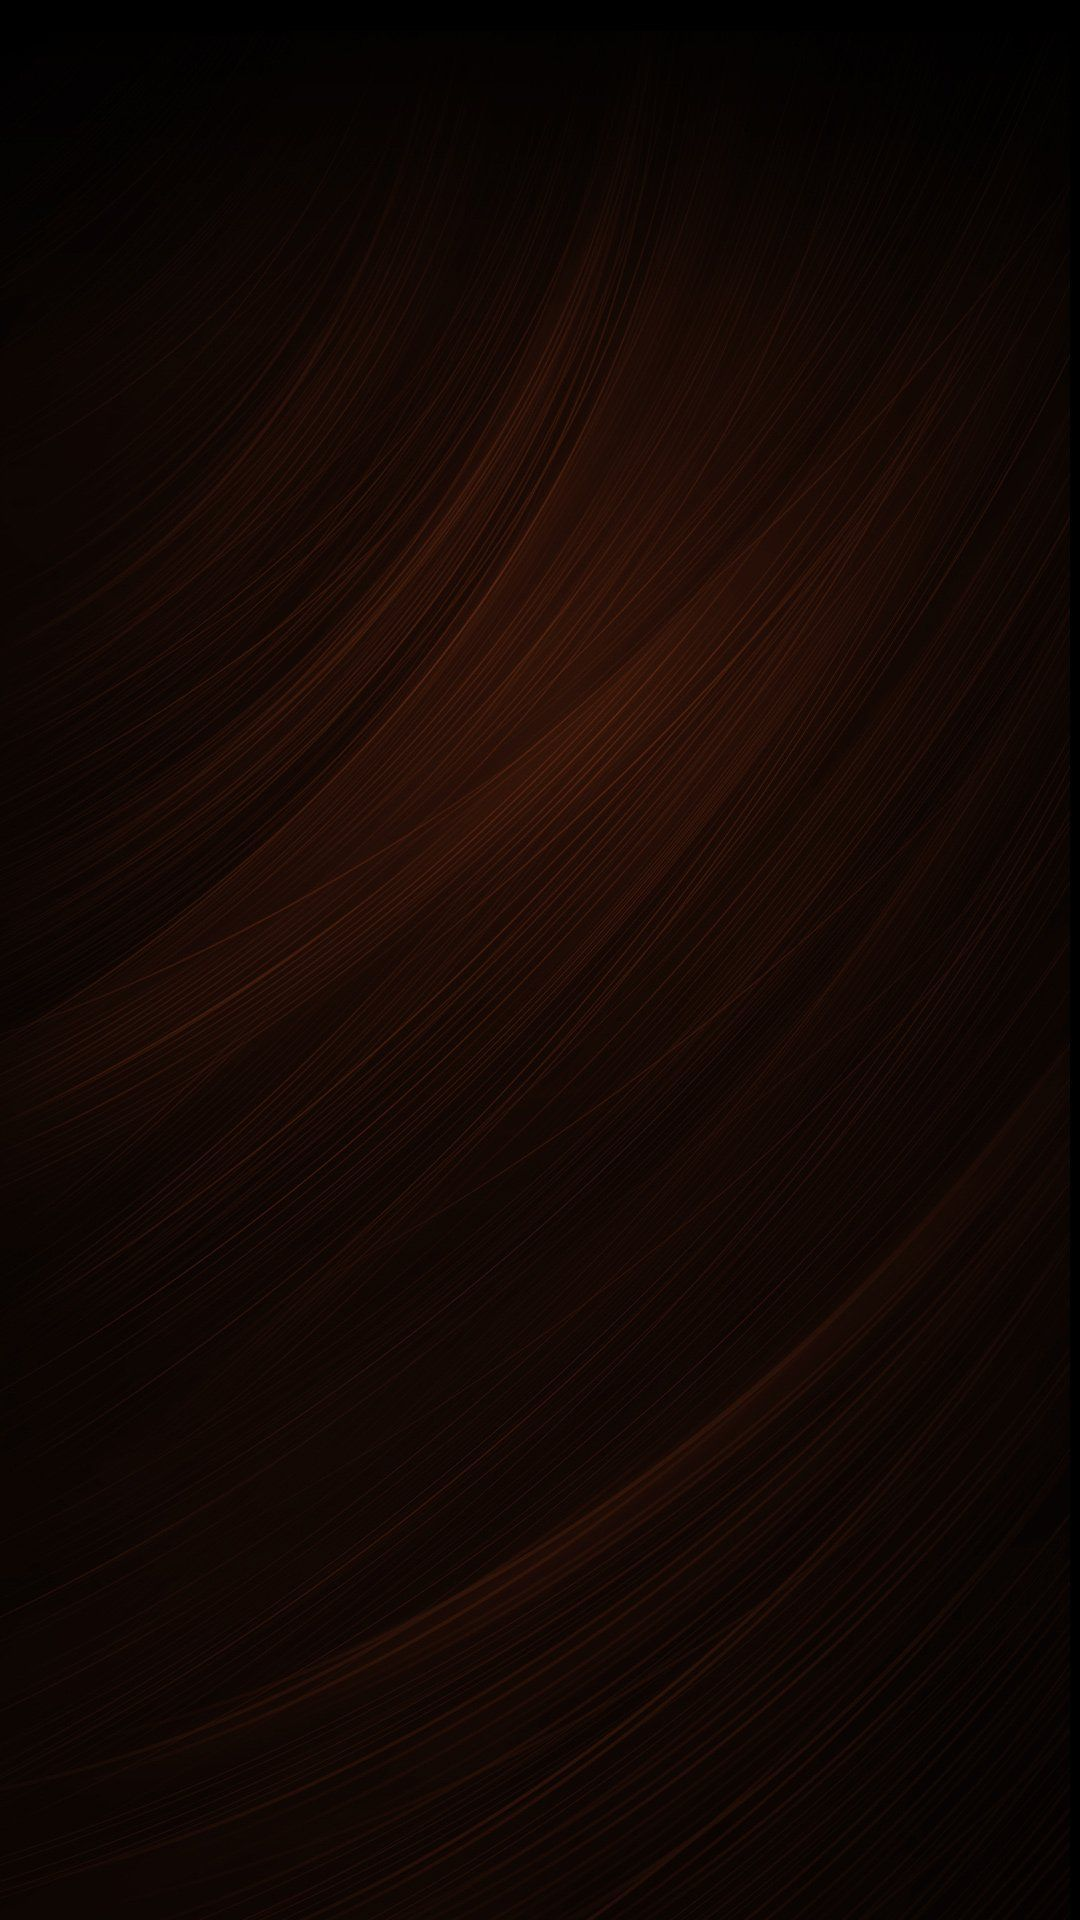 Dark Abstract Iphone Wallpapers Top Free Dark Abstract Iphone Backgrounds Wallpaperaccess